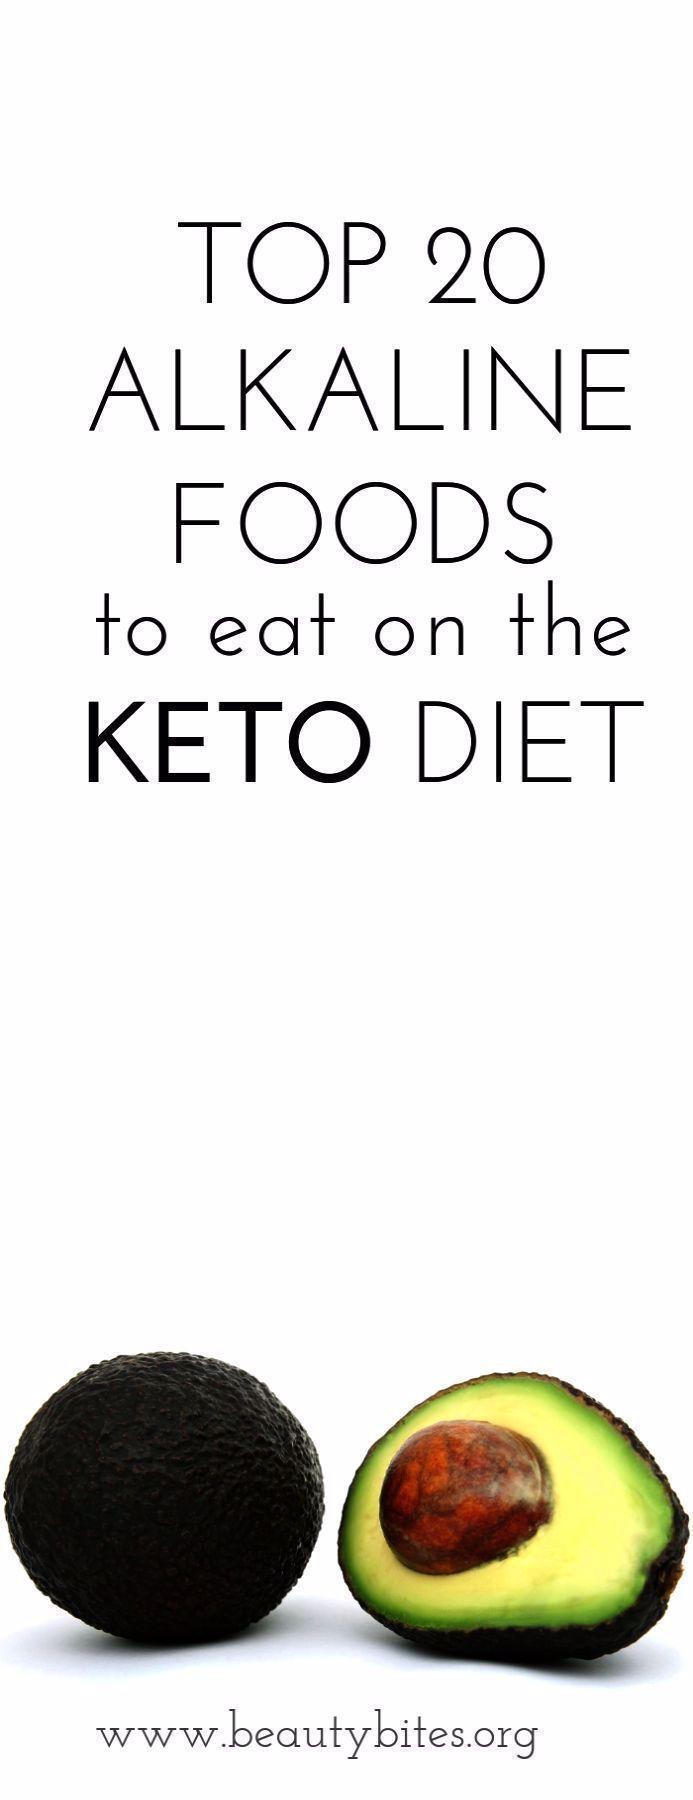 Healthy Eating Plan Aldi lest Clean Eating For Beginners Shopping List, #Aldi #... - Kahn&RawFD